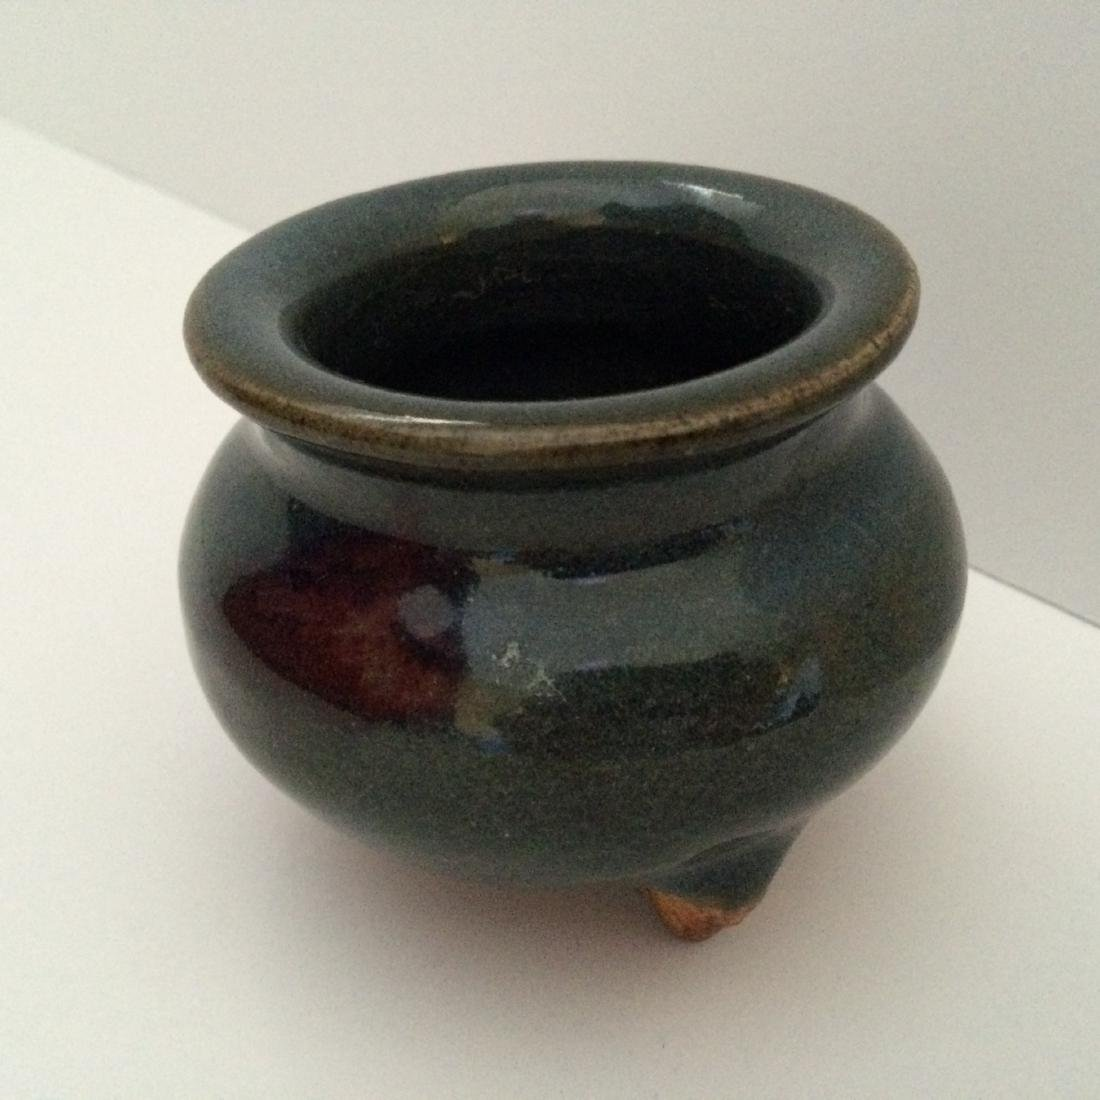 Chinese Jin Dynasty Style Jun Ware Glazed Tripod Censer